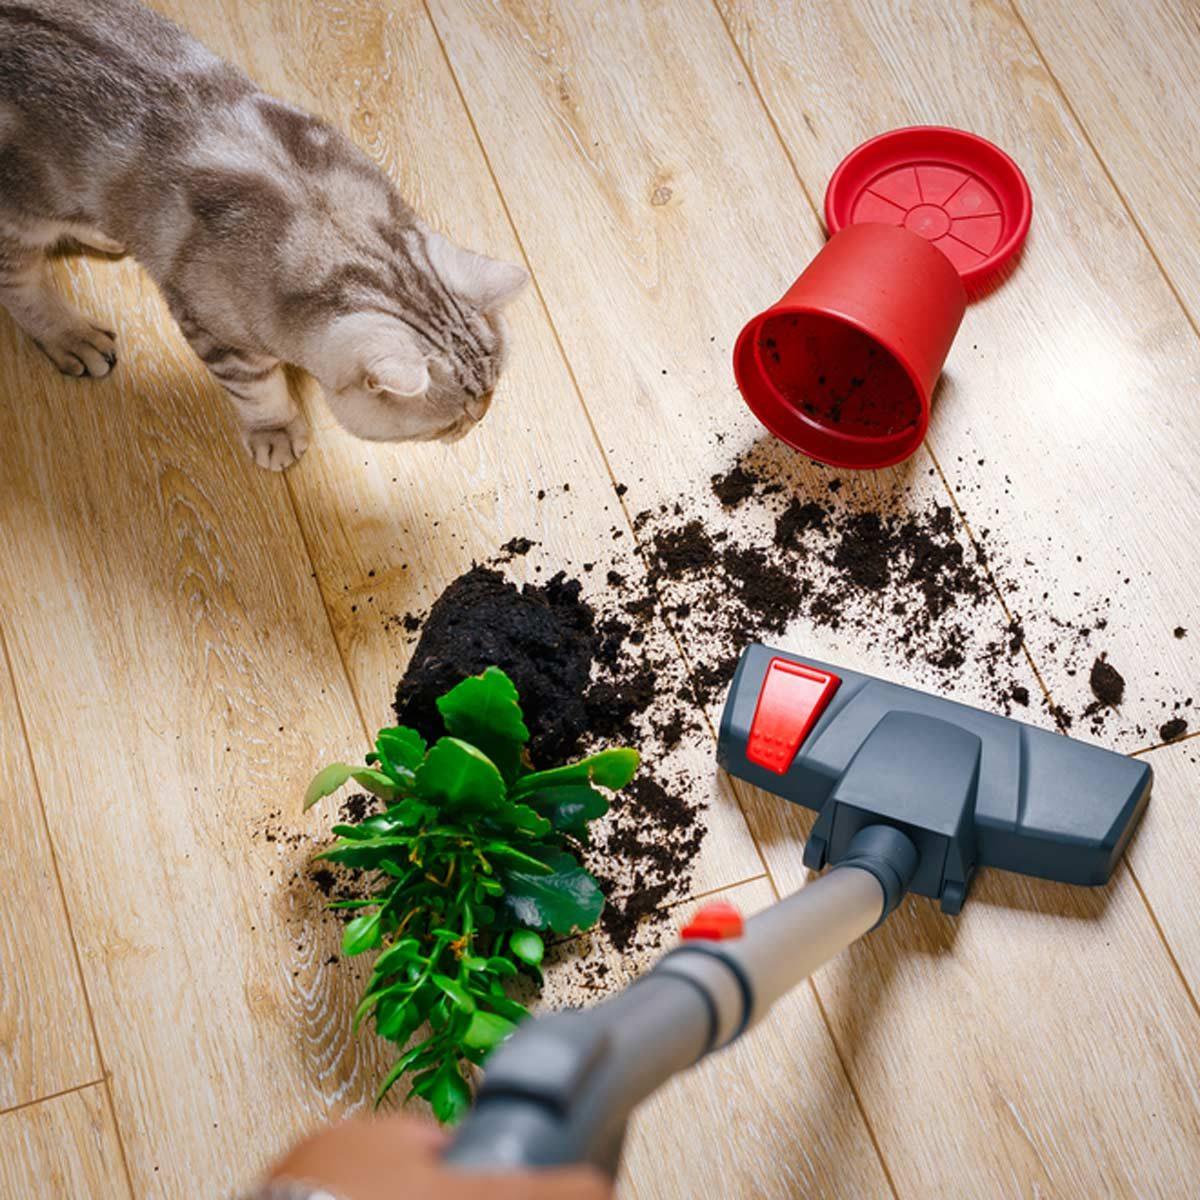 Cordless Home Vacuum